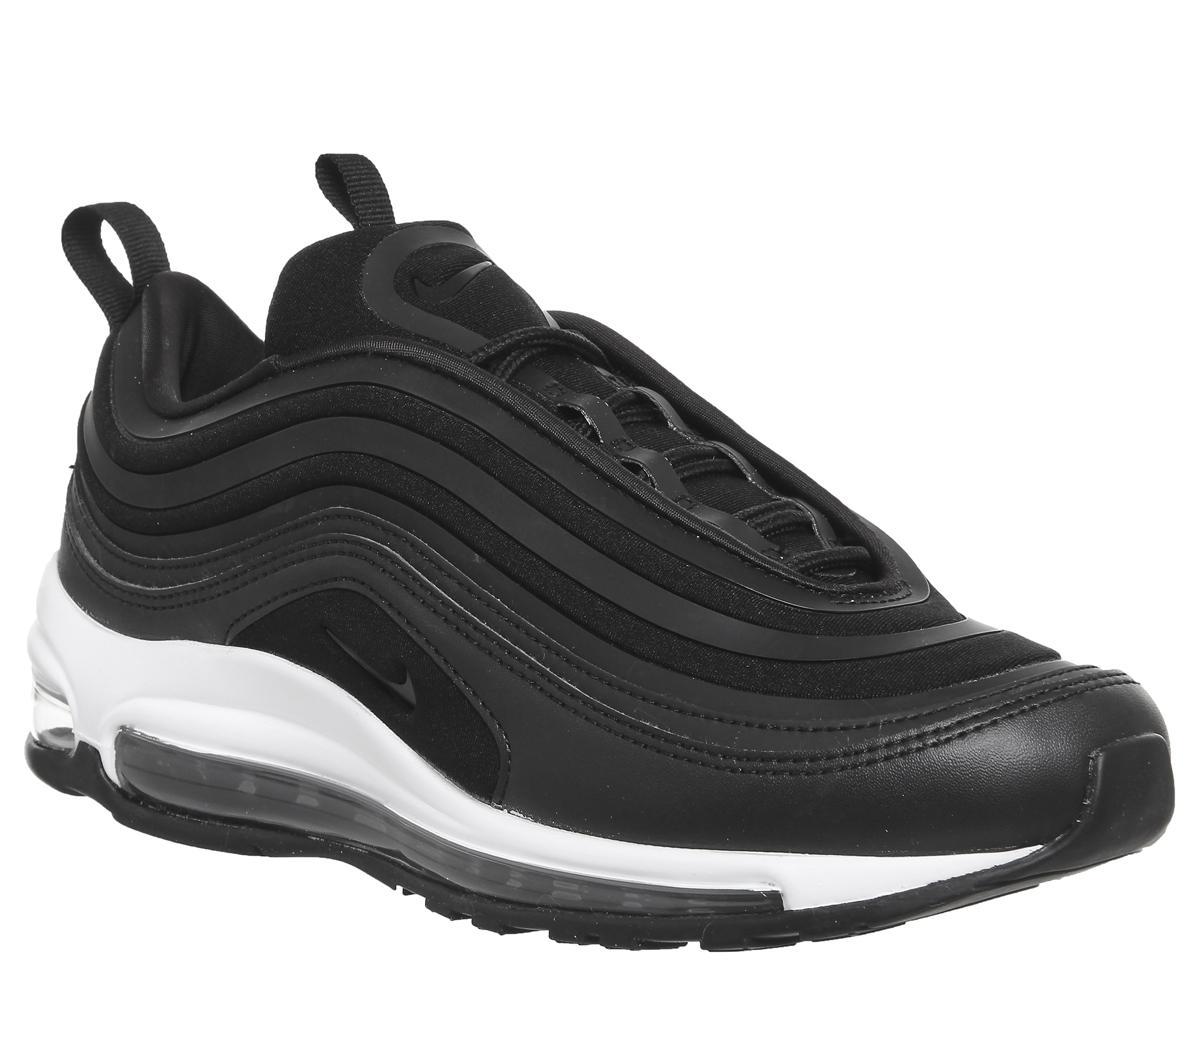 nike shoes 97 black